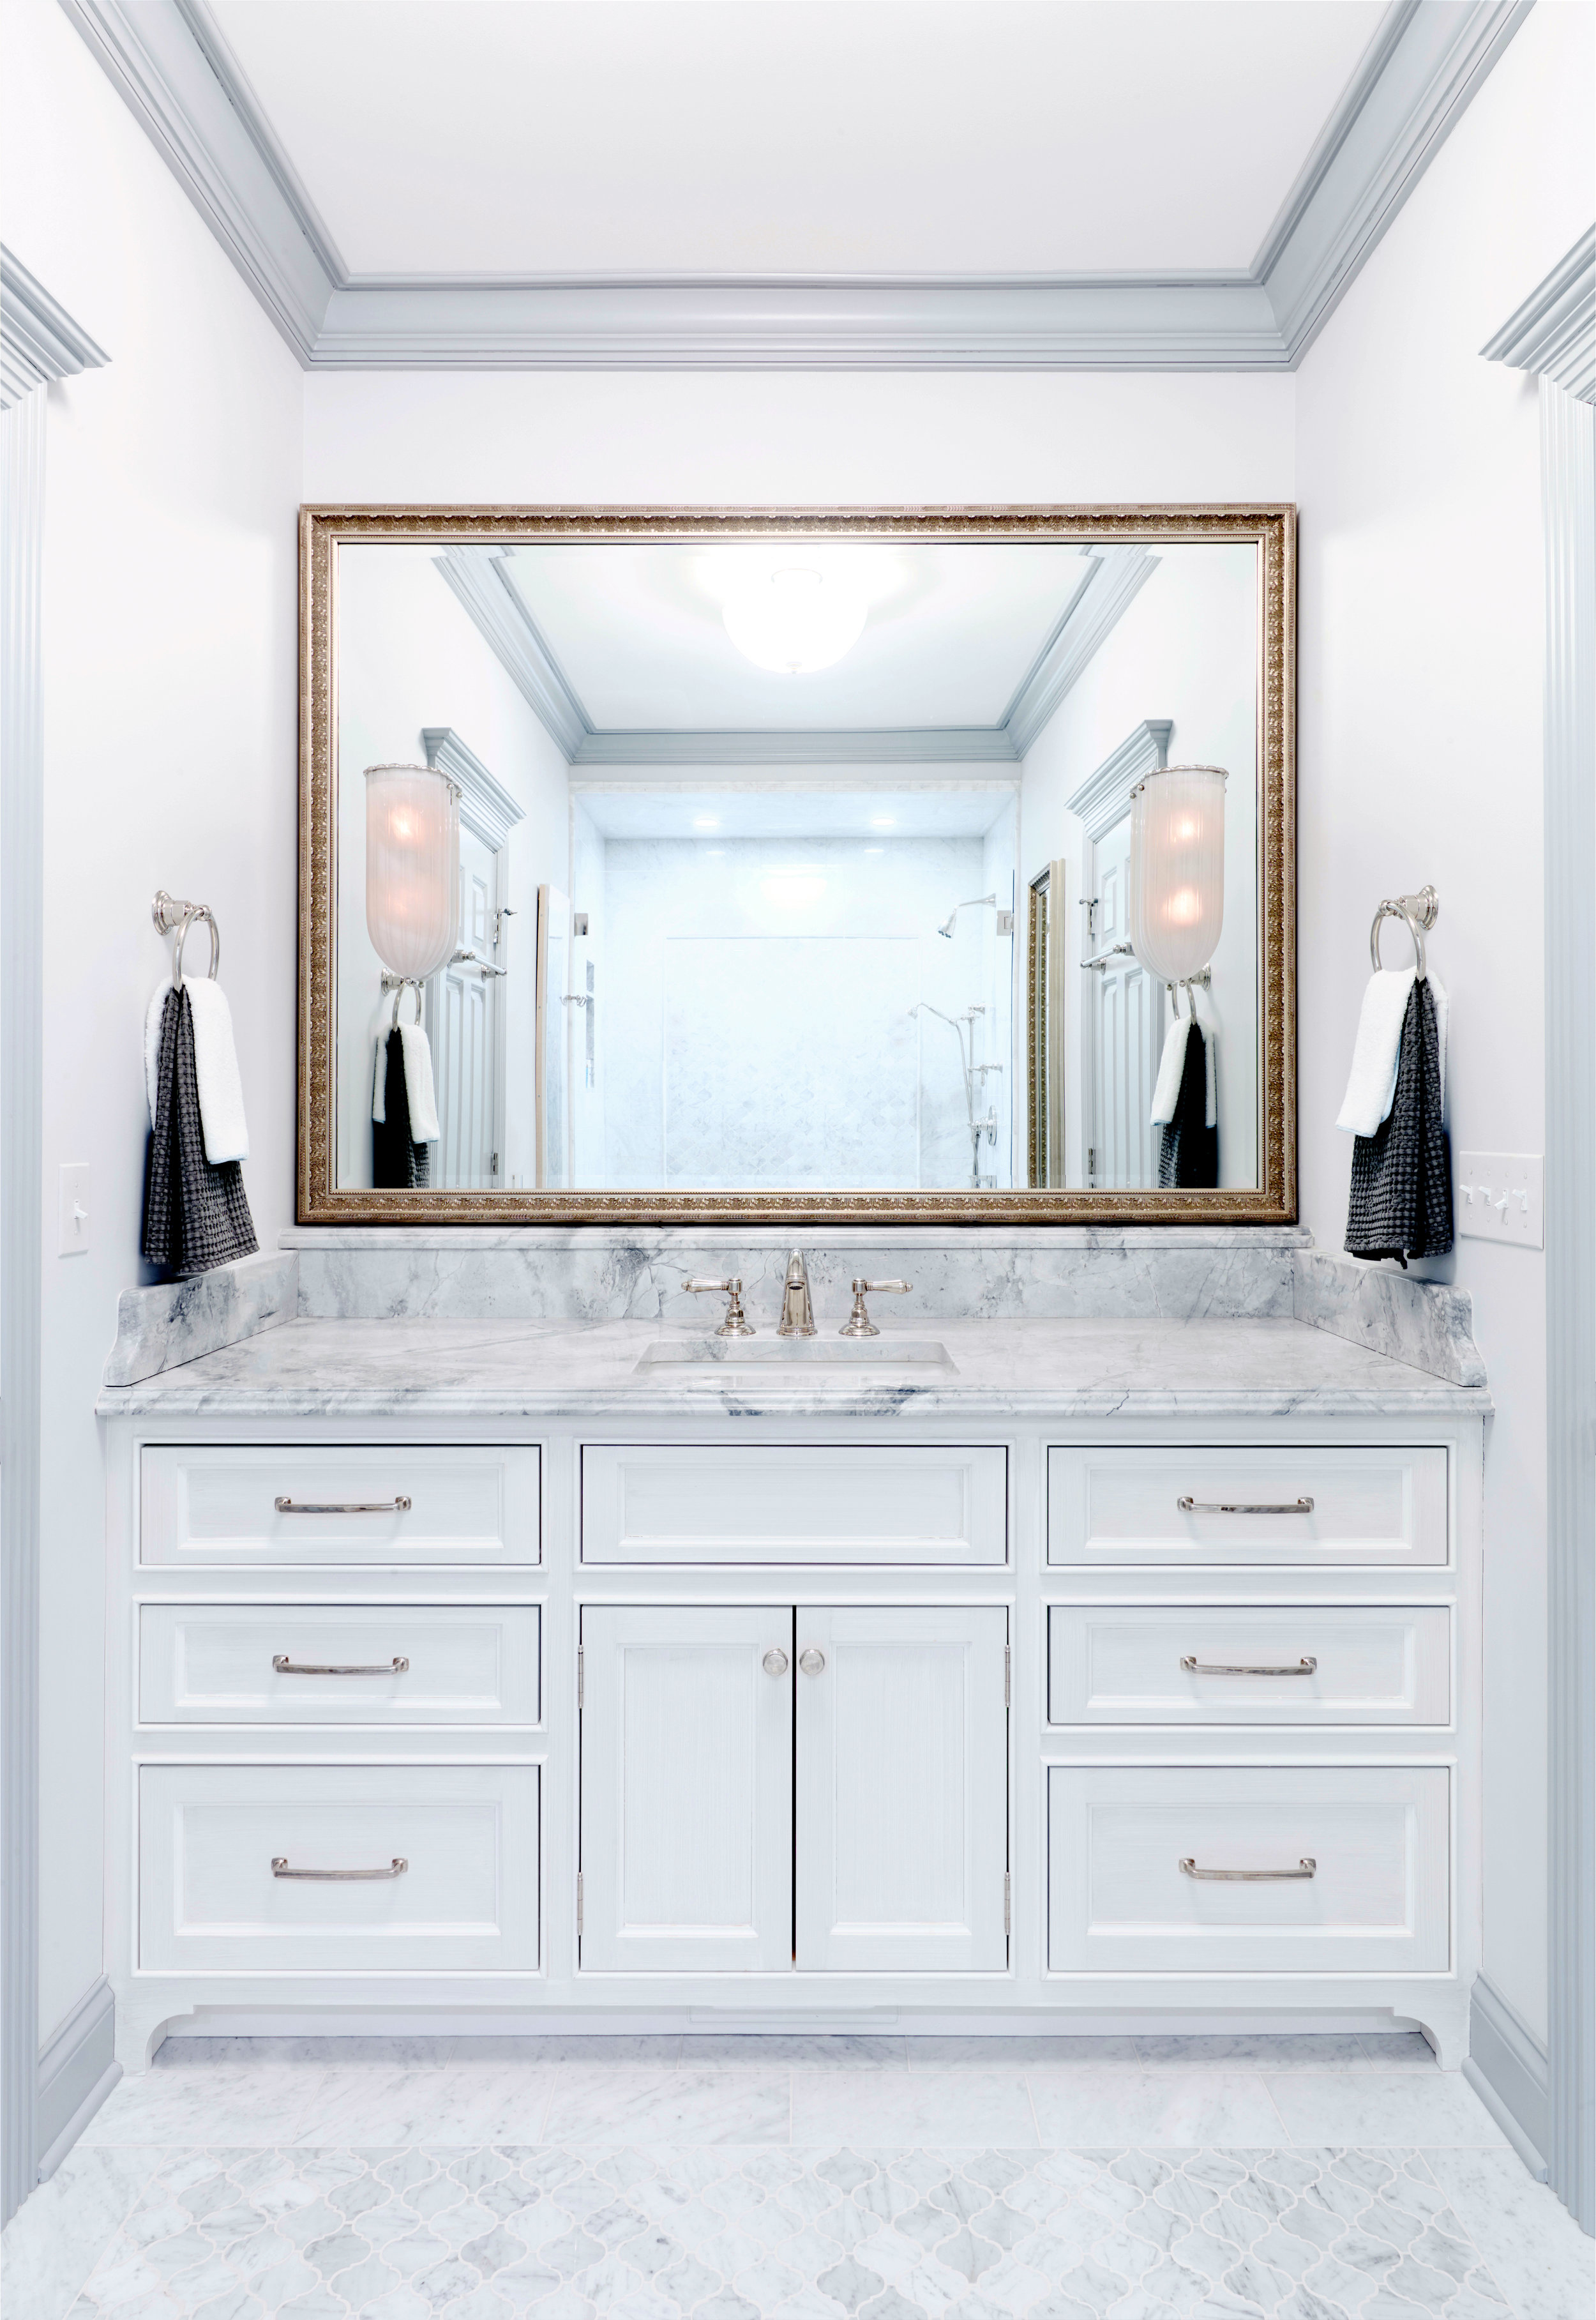 scmurphyllc_bathroom_minimal.jpg